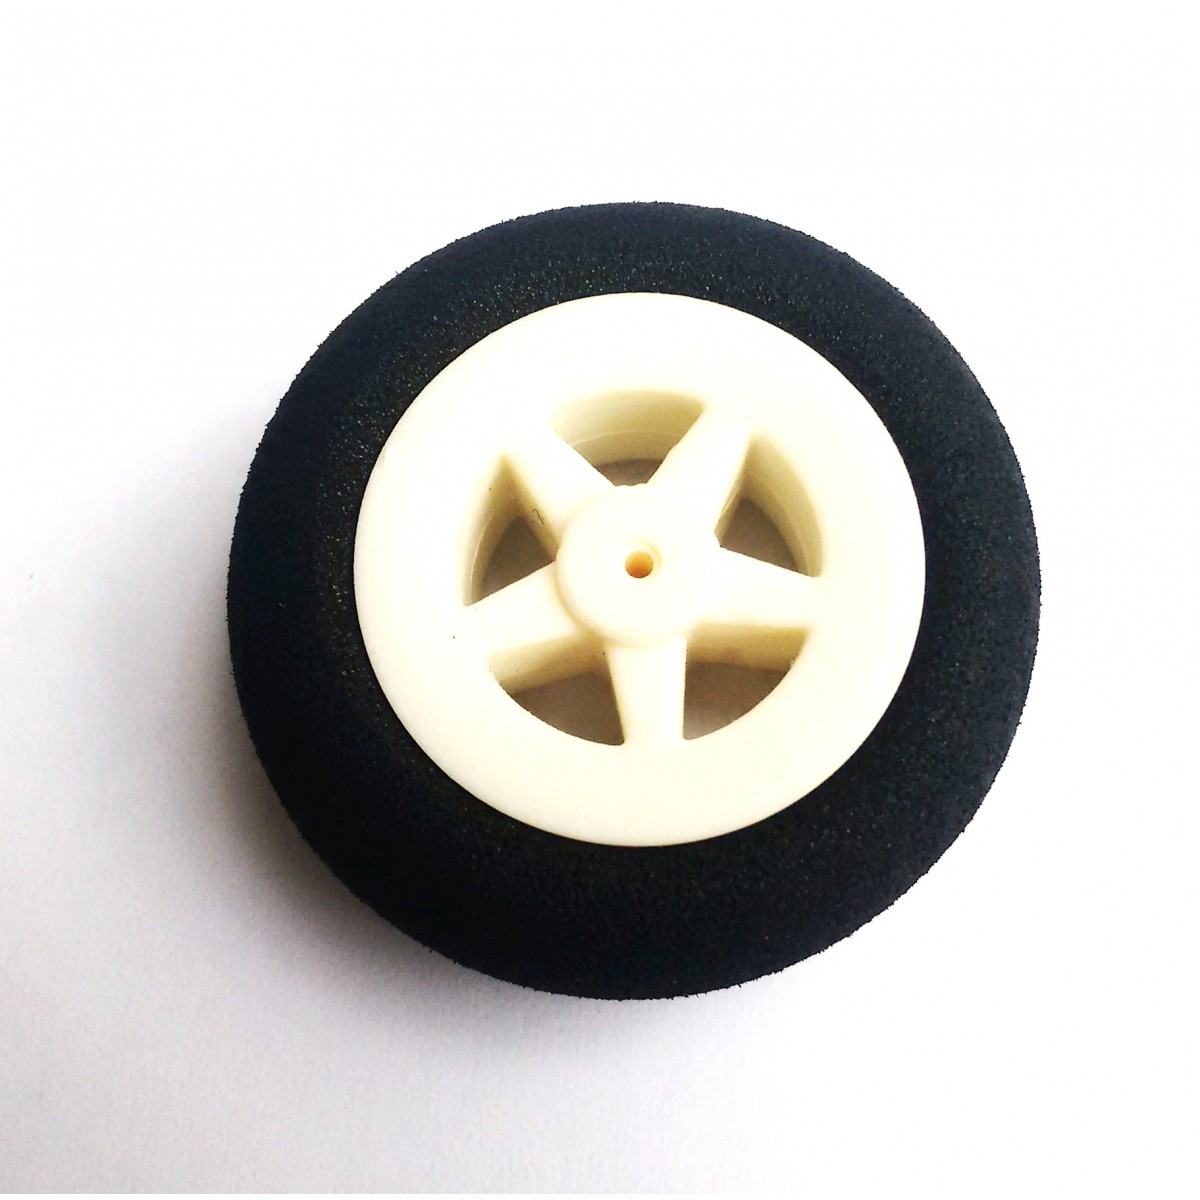 10396 - Roda Light Foam (Diâmetro: 30mm, Largura: 11mm)